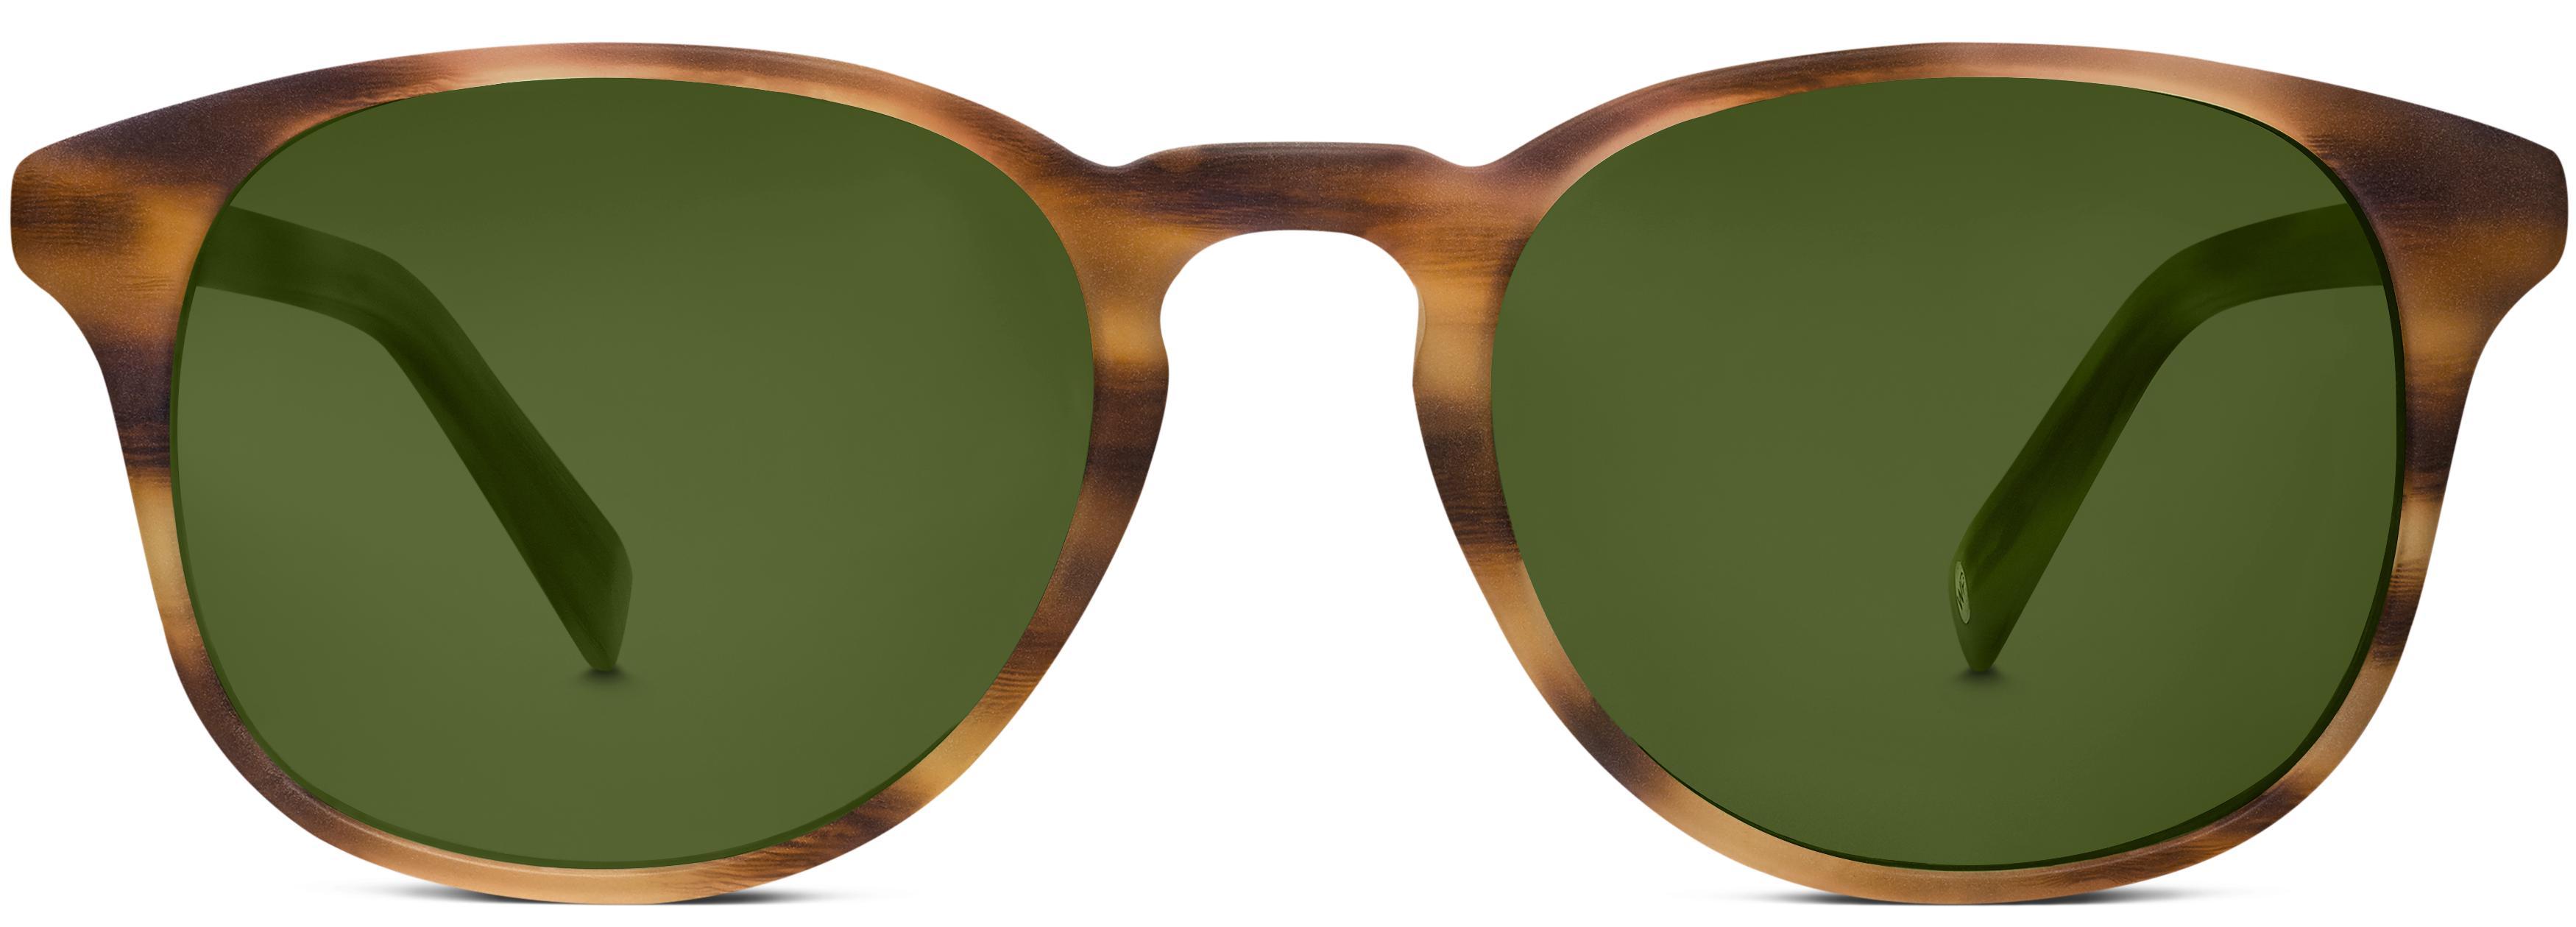 9d263e21286 Men s Sunglasses